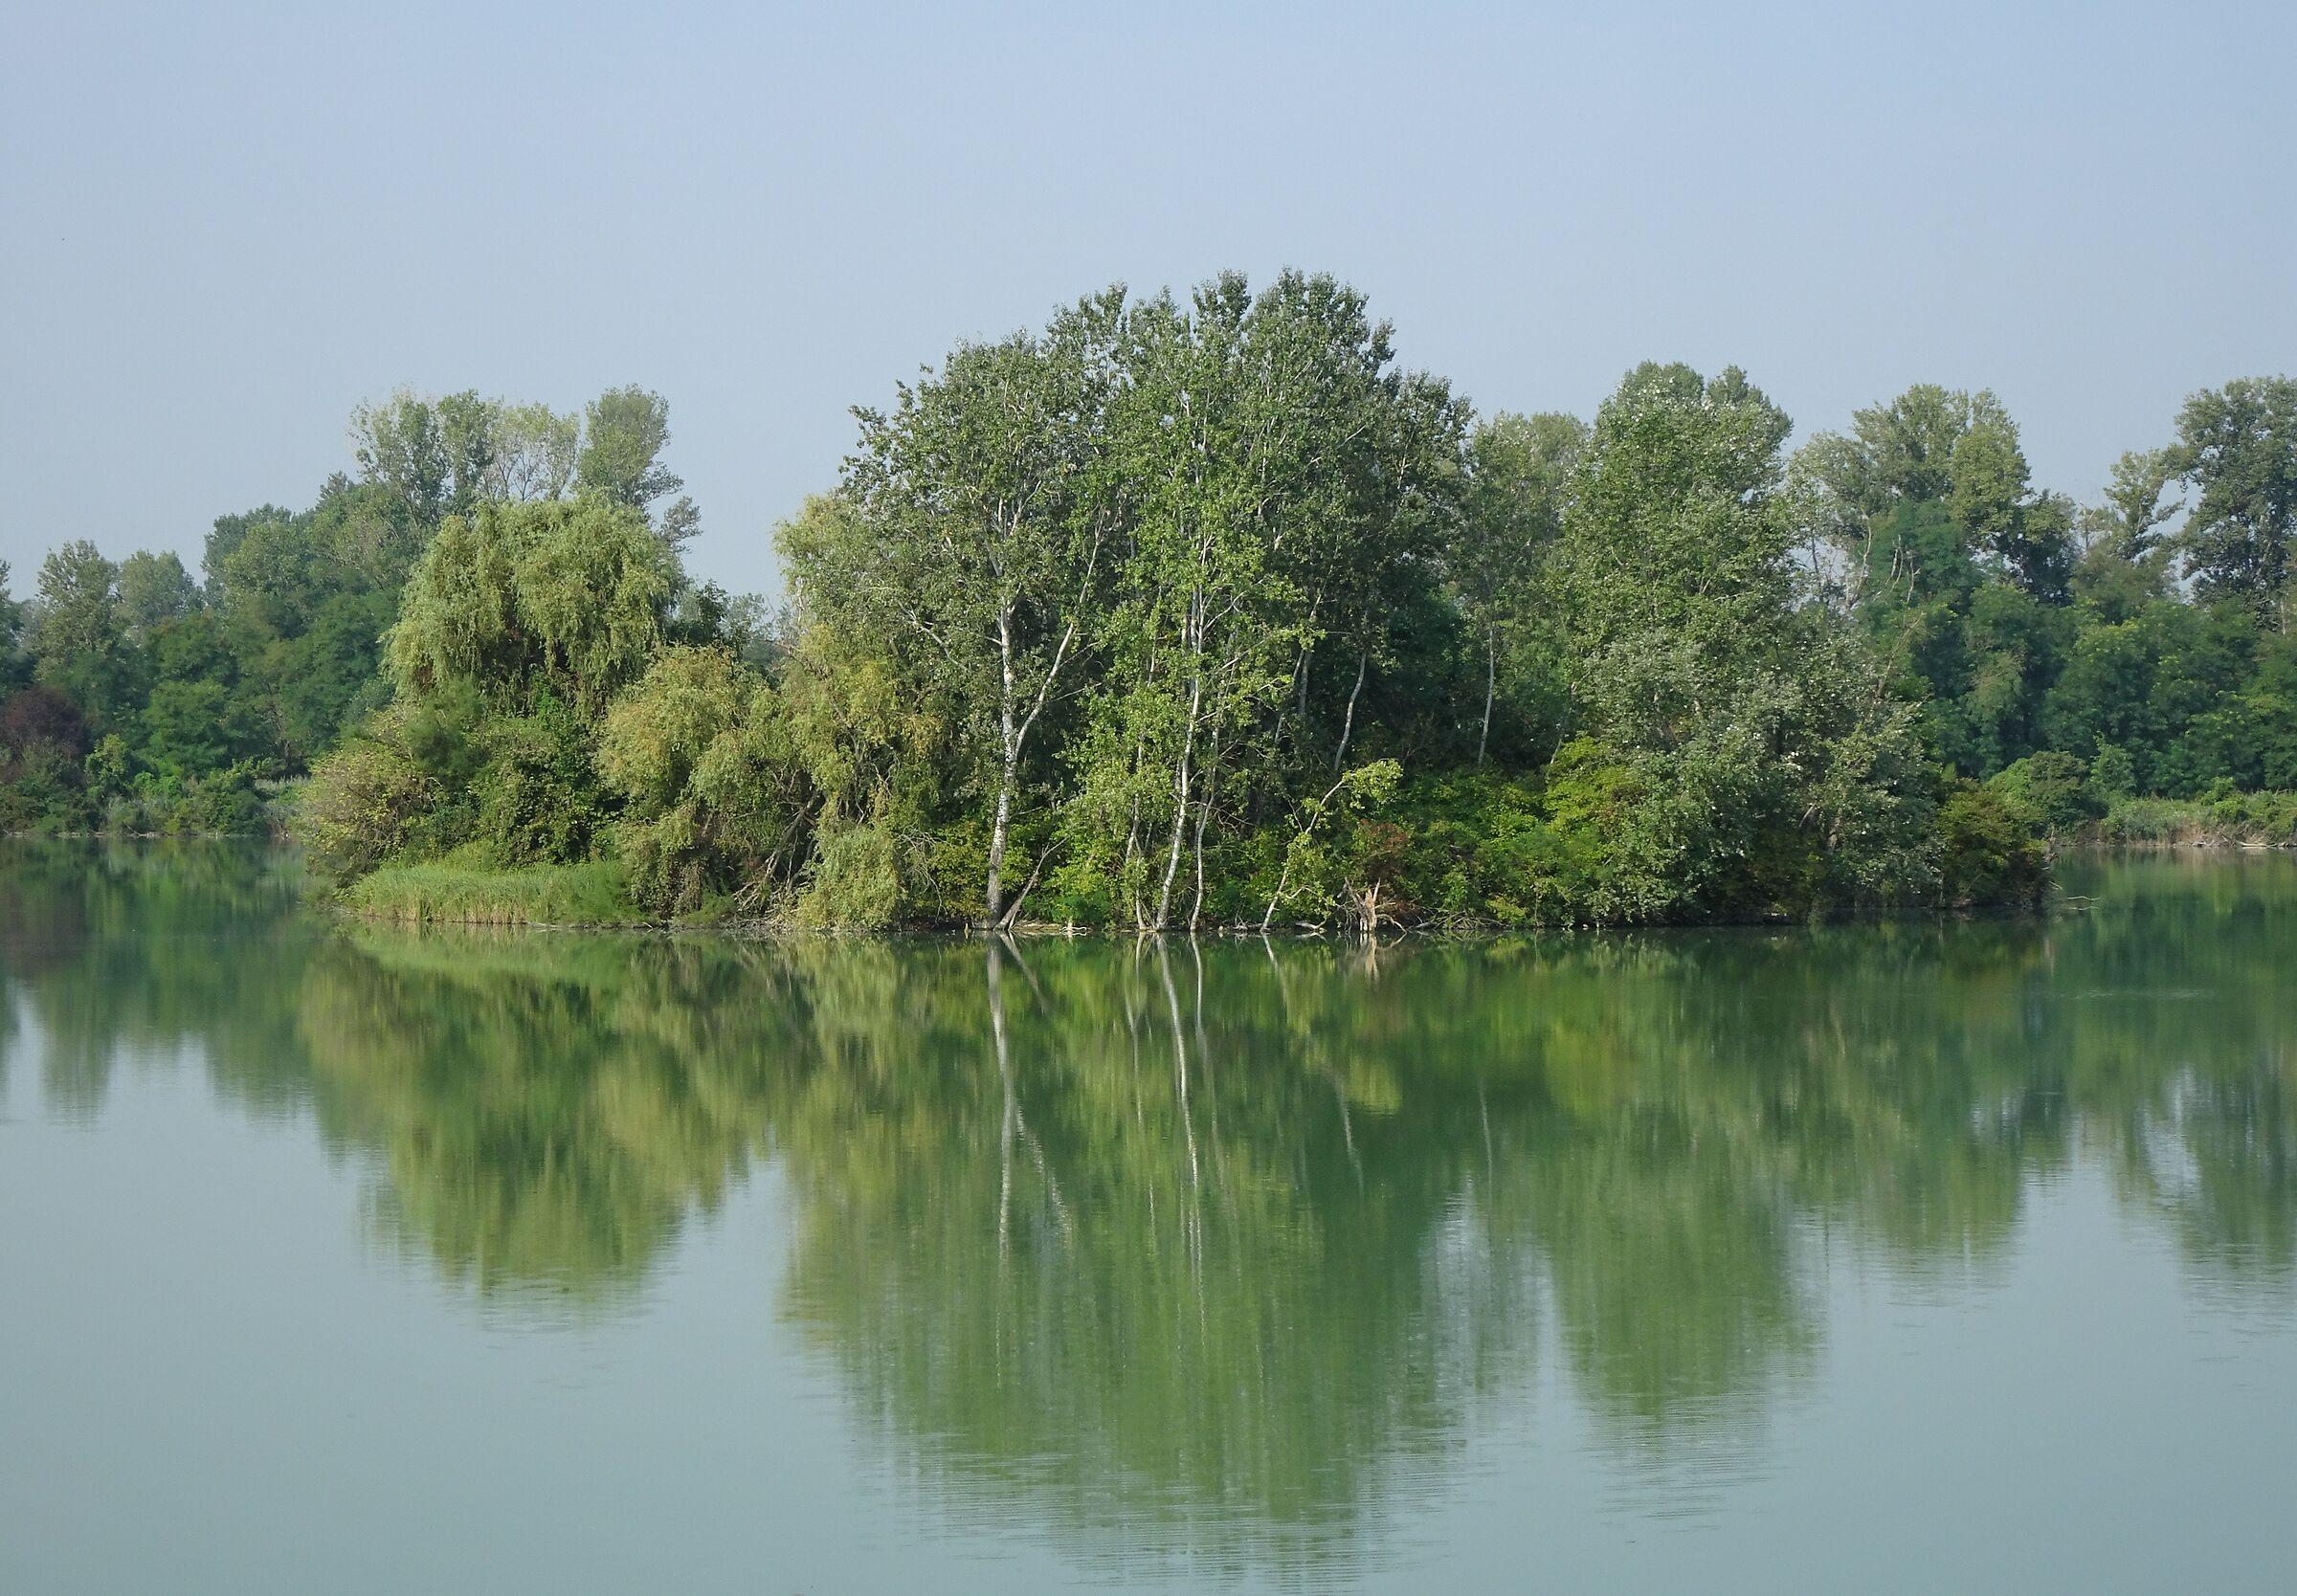 Lakes of S. Anna - S. Cesario on the Panaro (MO) 2...